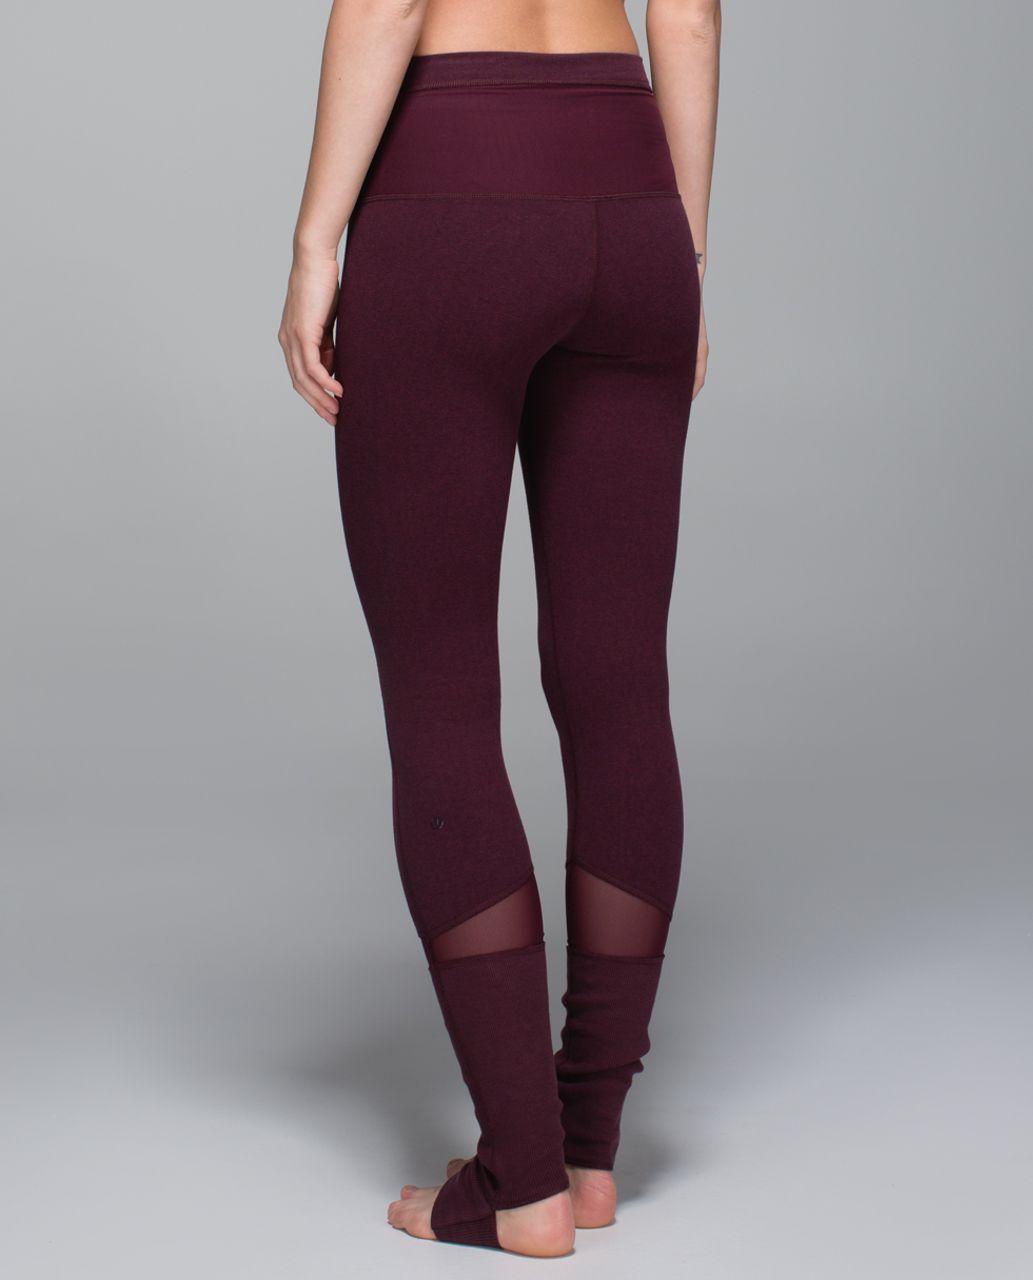 Lululemon Devi Yoga Pant - Heathered Bordeaux Drama   Black Cherry - lulu  fanatics 533df73eef6b4